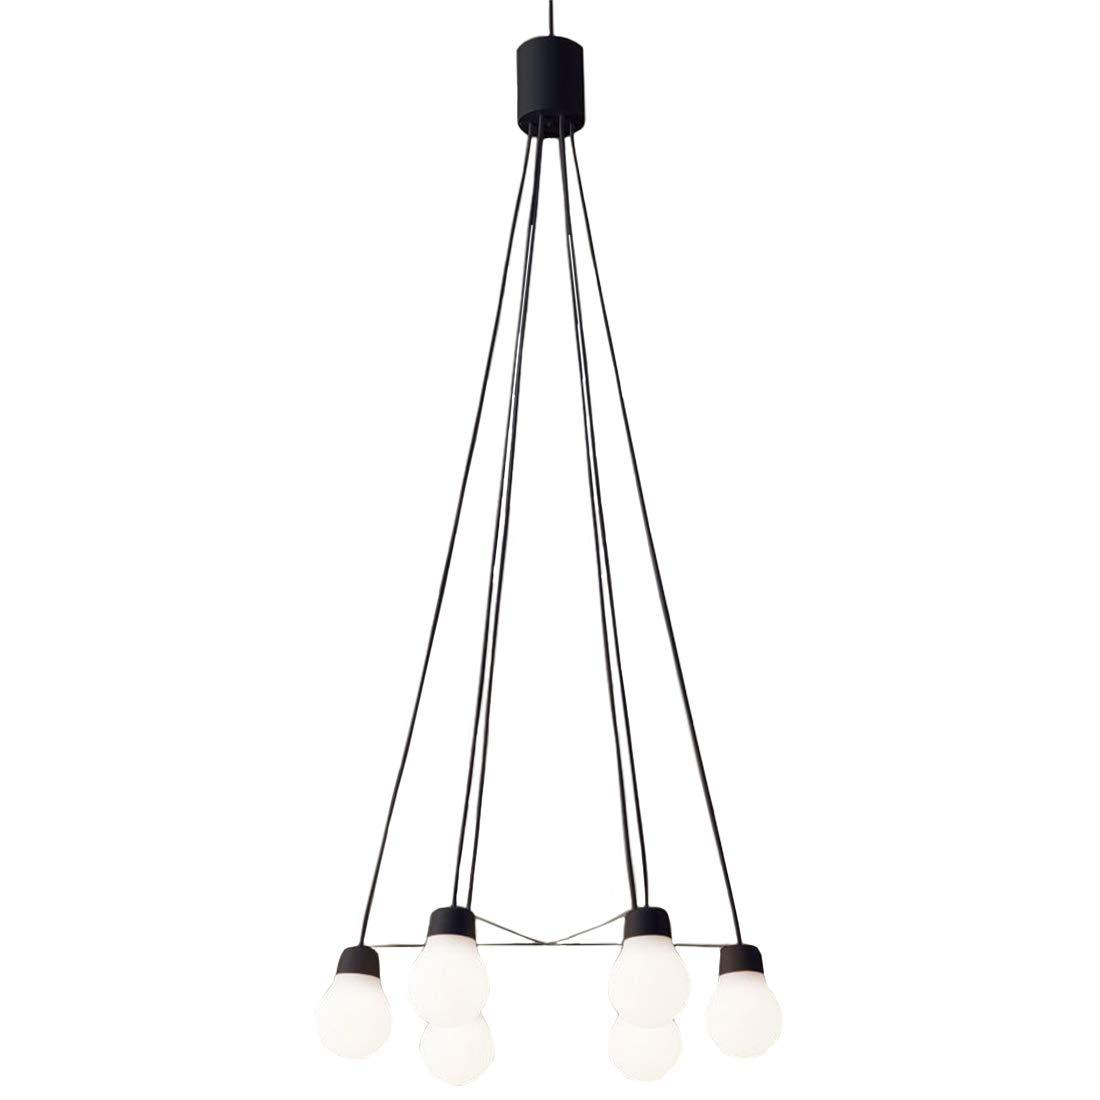 LGB19629BCE1LED吹き抜け灯 ペンダントライト 温白色 天井照明 吊下げ直付タイプ 要電気工事 拡散タイプ 白熱電球60形6灯器具相当 LAMP DESIGNシリーズPanasonic 照明器具